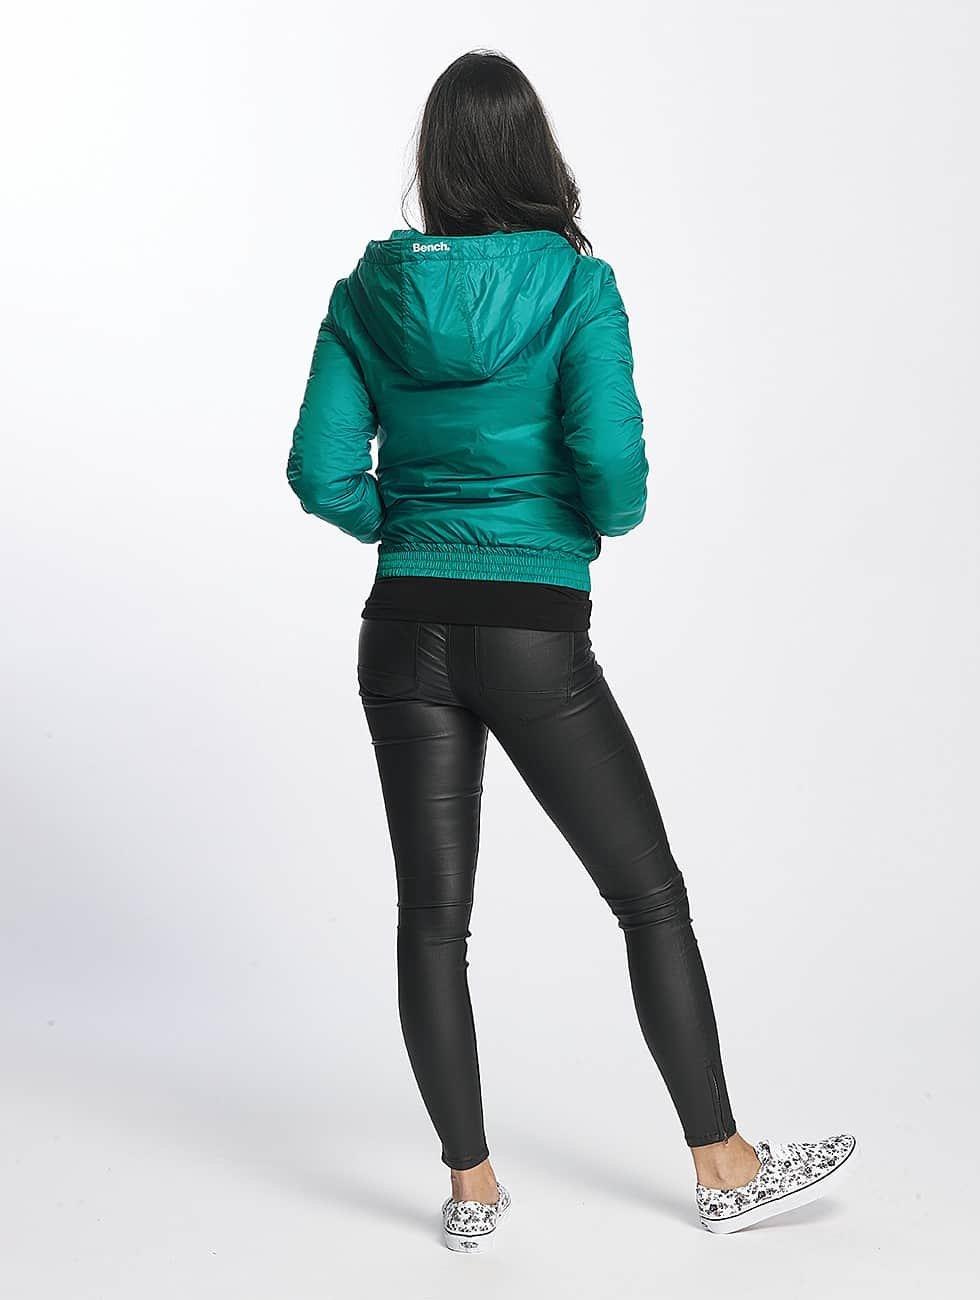 Bench Демисезонная куртка Light Padded бирюзовый